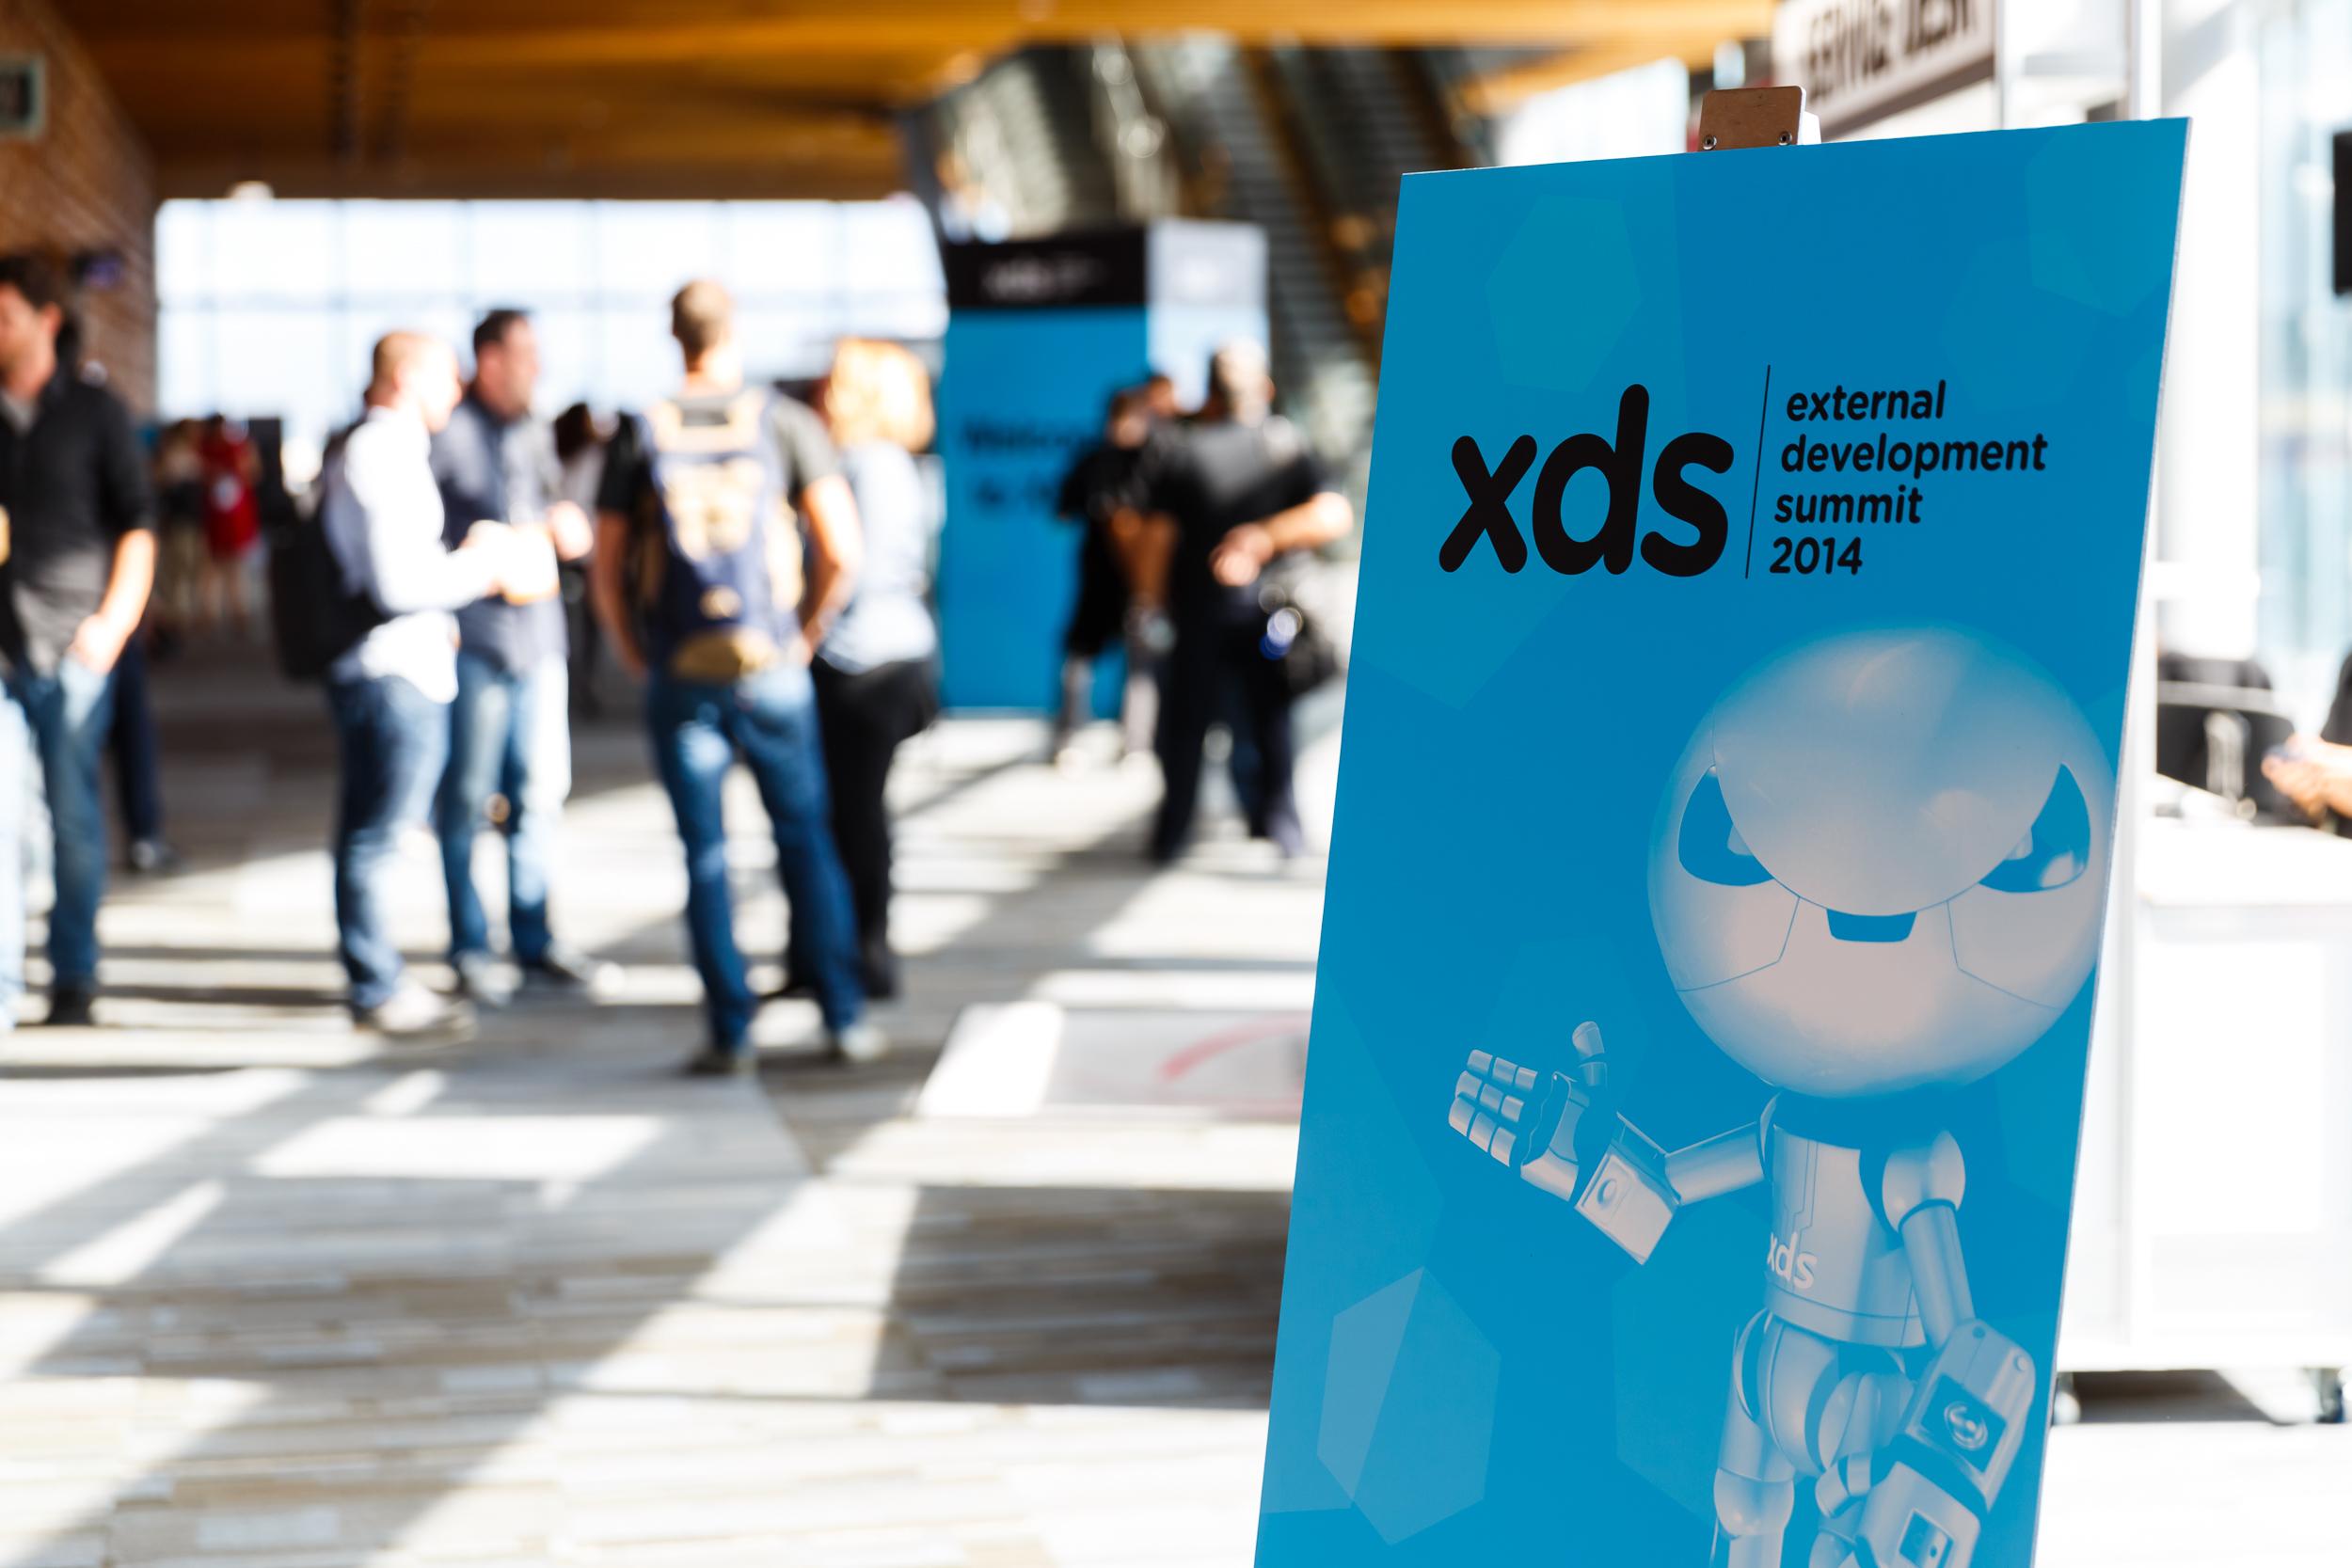 XDS-2014_image1.jpg